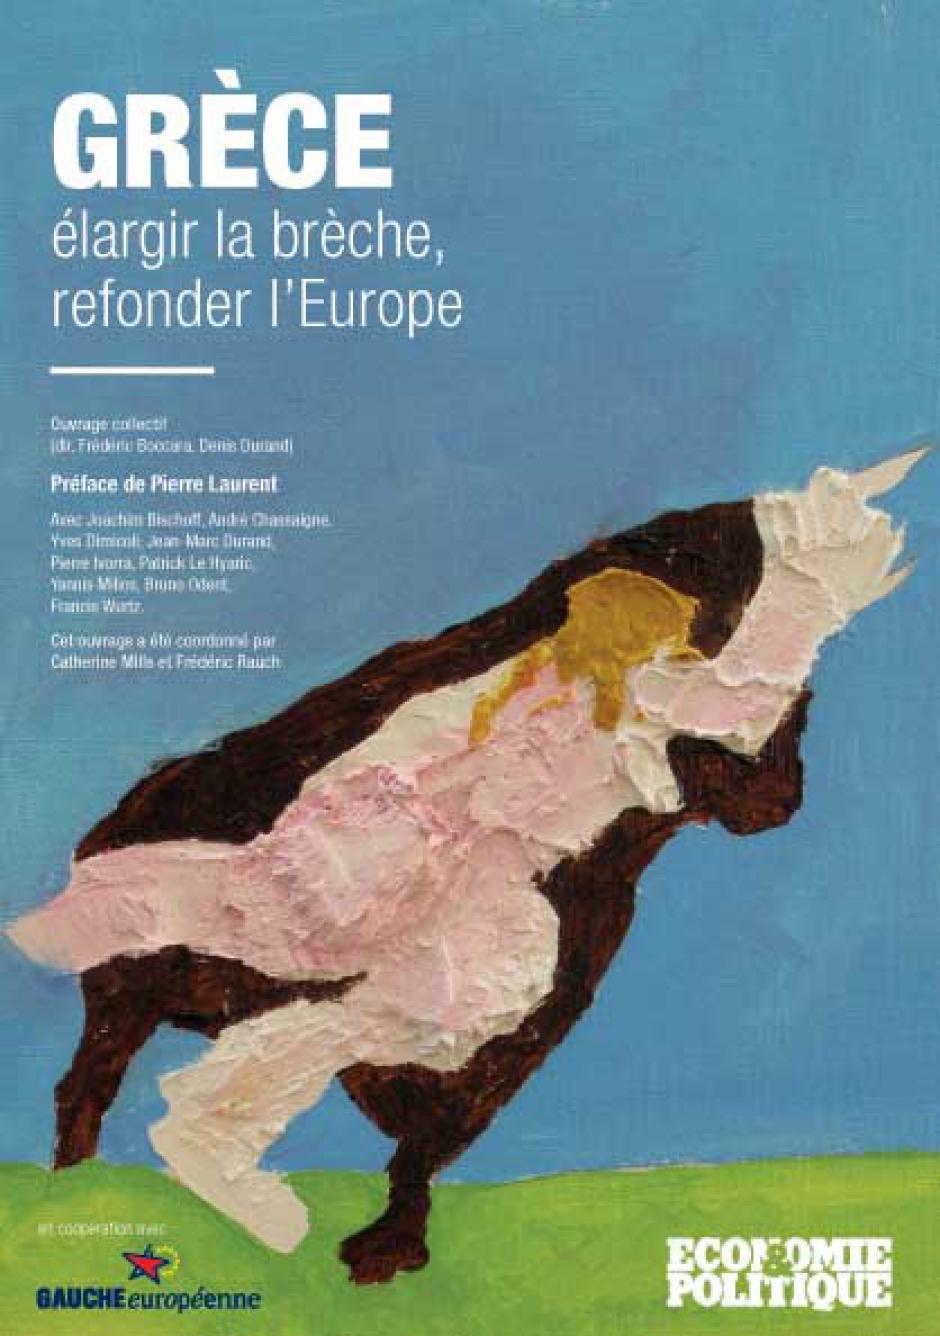 « GRÈCE, élargir la brèche, refonder l'Europe »